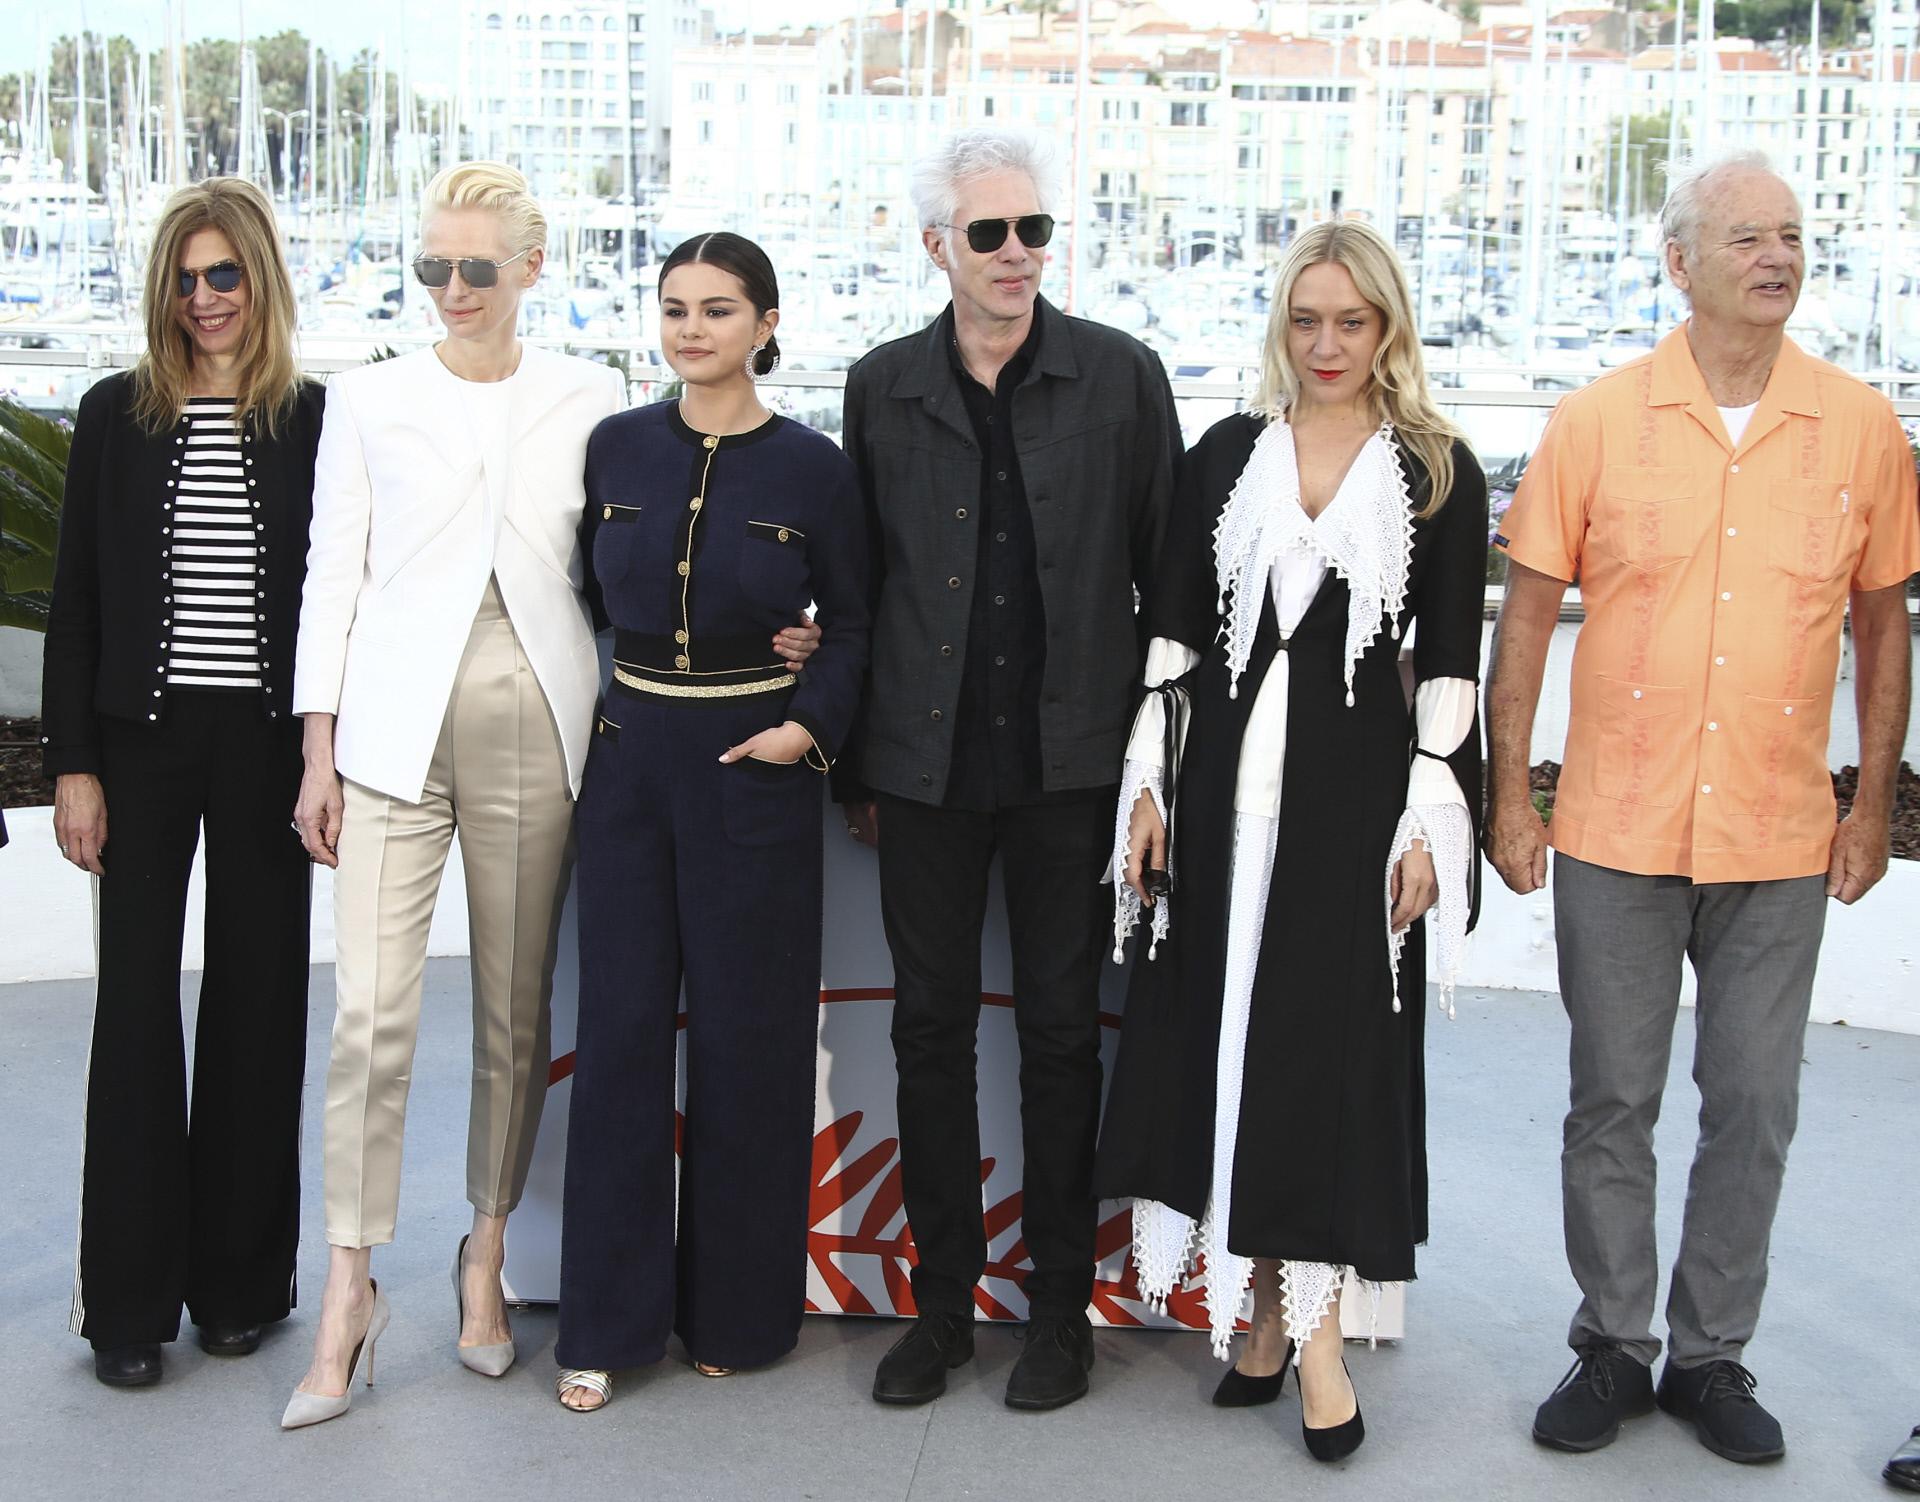 Sara Driver, Selena Gomez, Tilda Swinton, Jim Jarmusch, Chloe Sevigny...